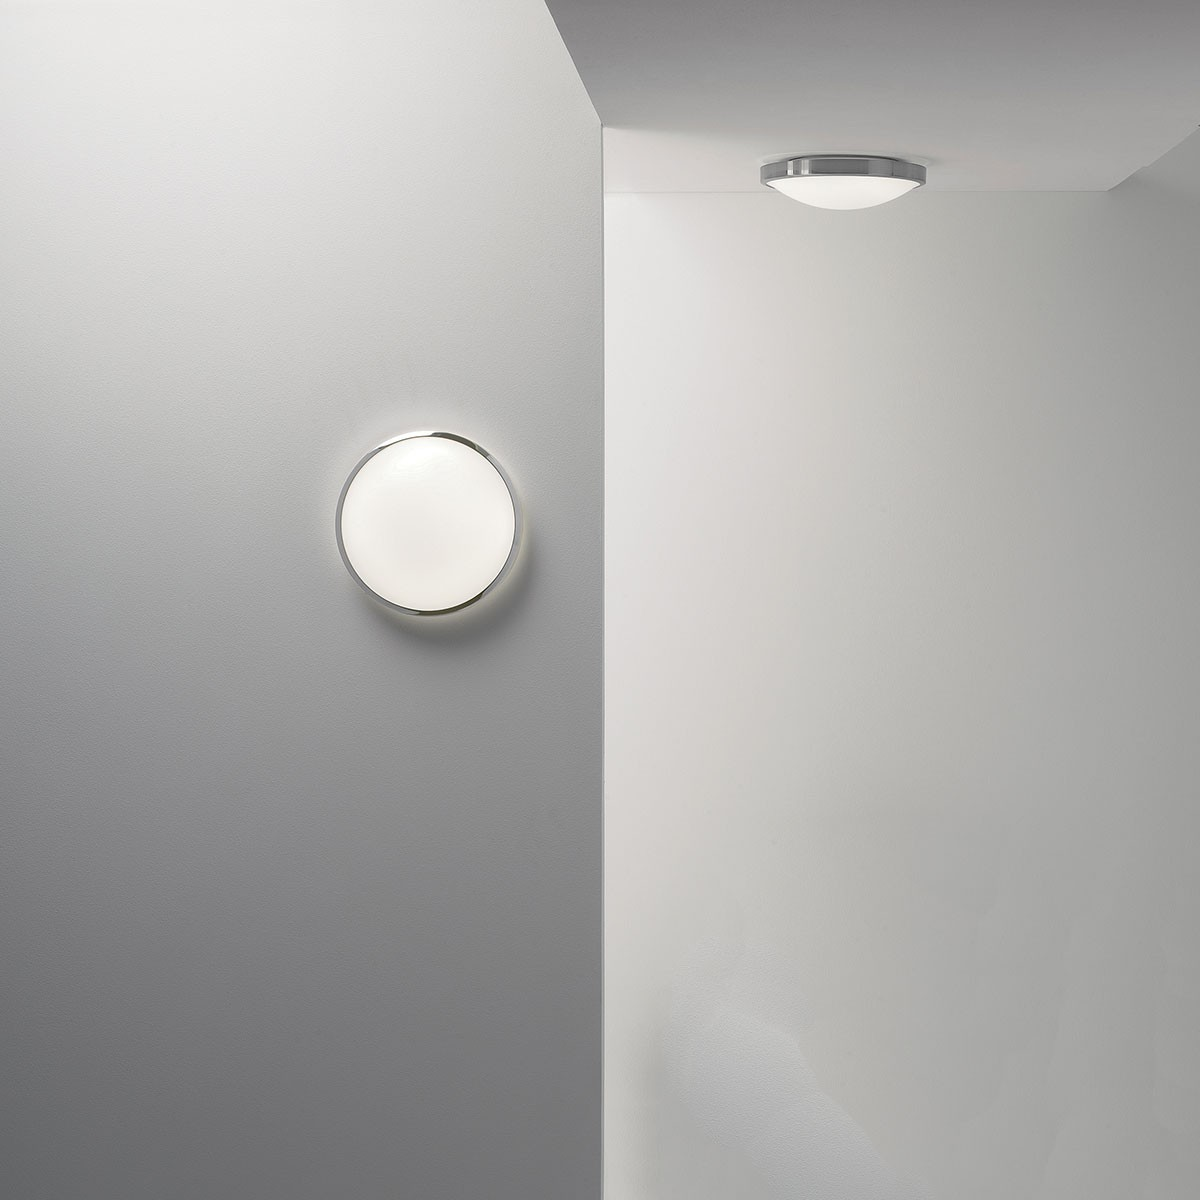 Led Ceiling Lights With Sensor: Astro Osaka Sensor Polished Chrome LED Ceiling Light With